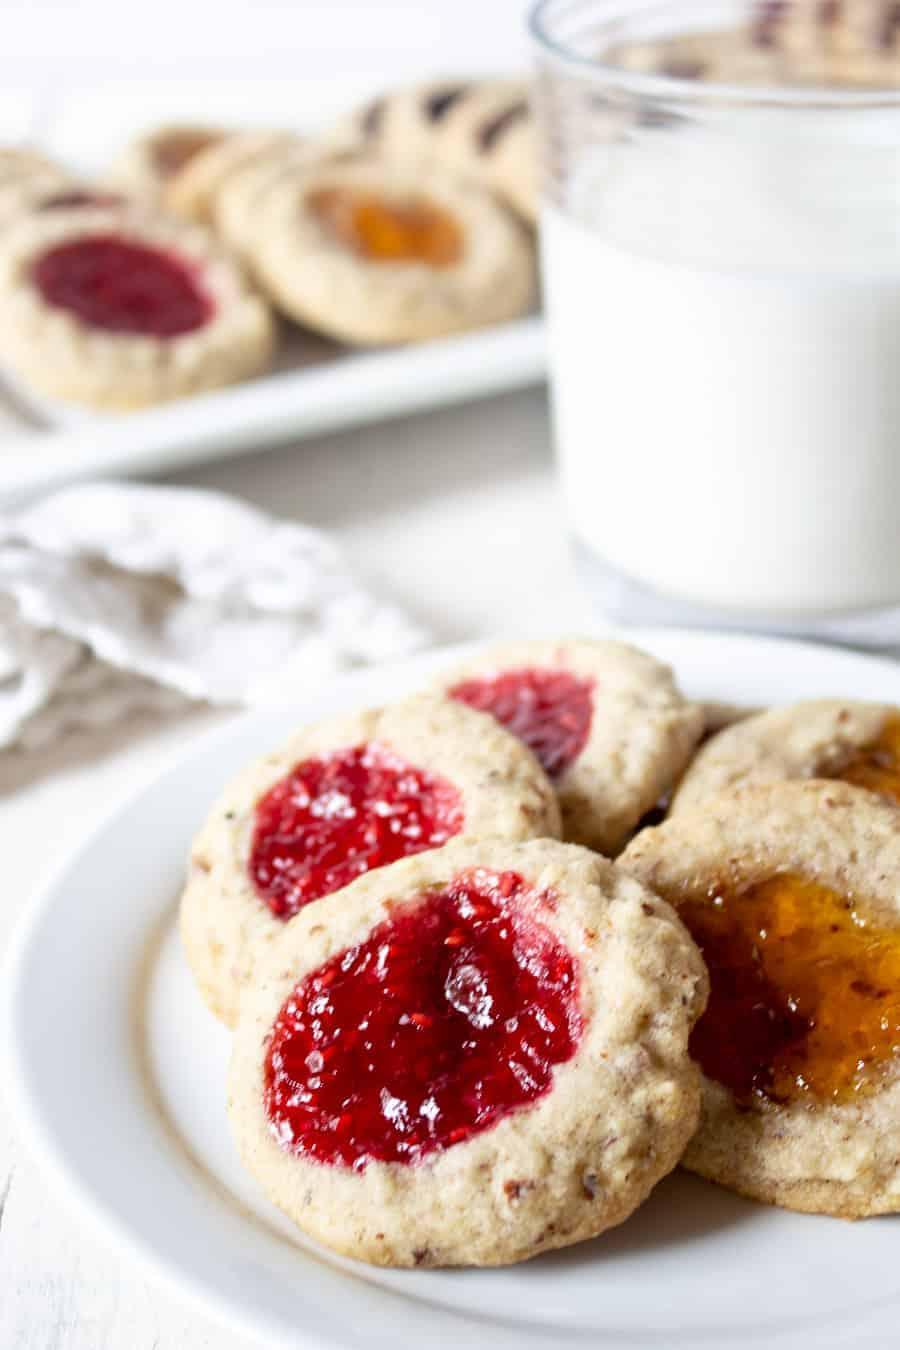 A plateful of thumbprint cookies.